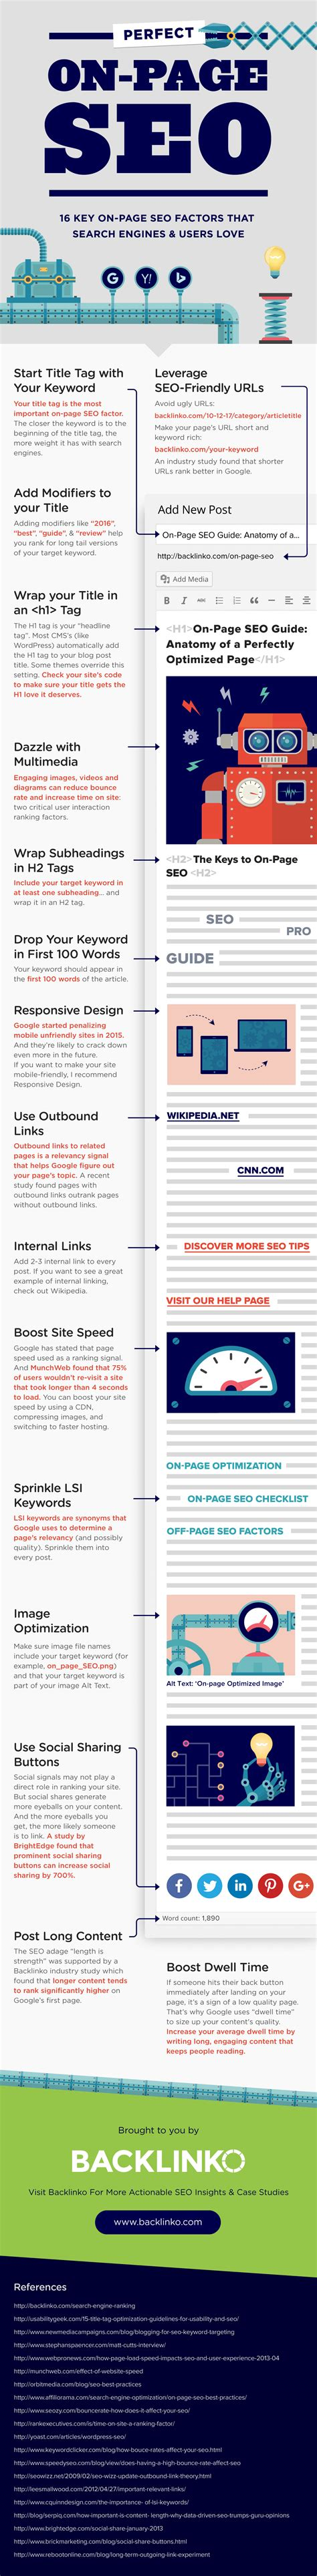 Page Seo Anatomy Perfectly Optimized